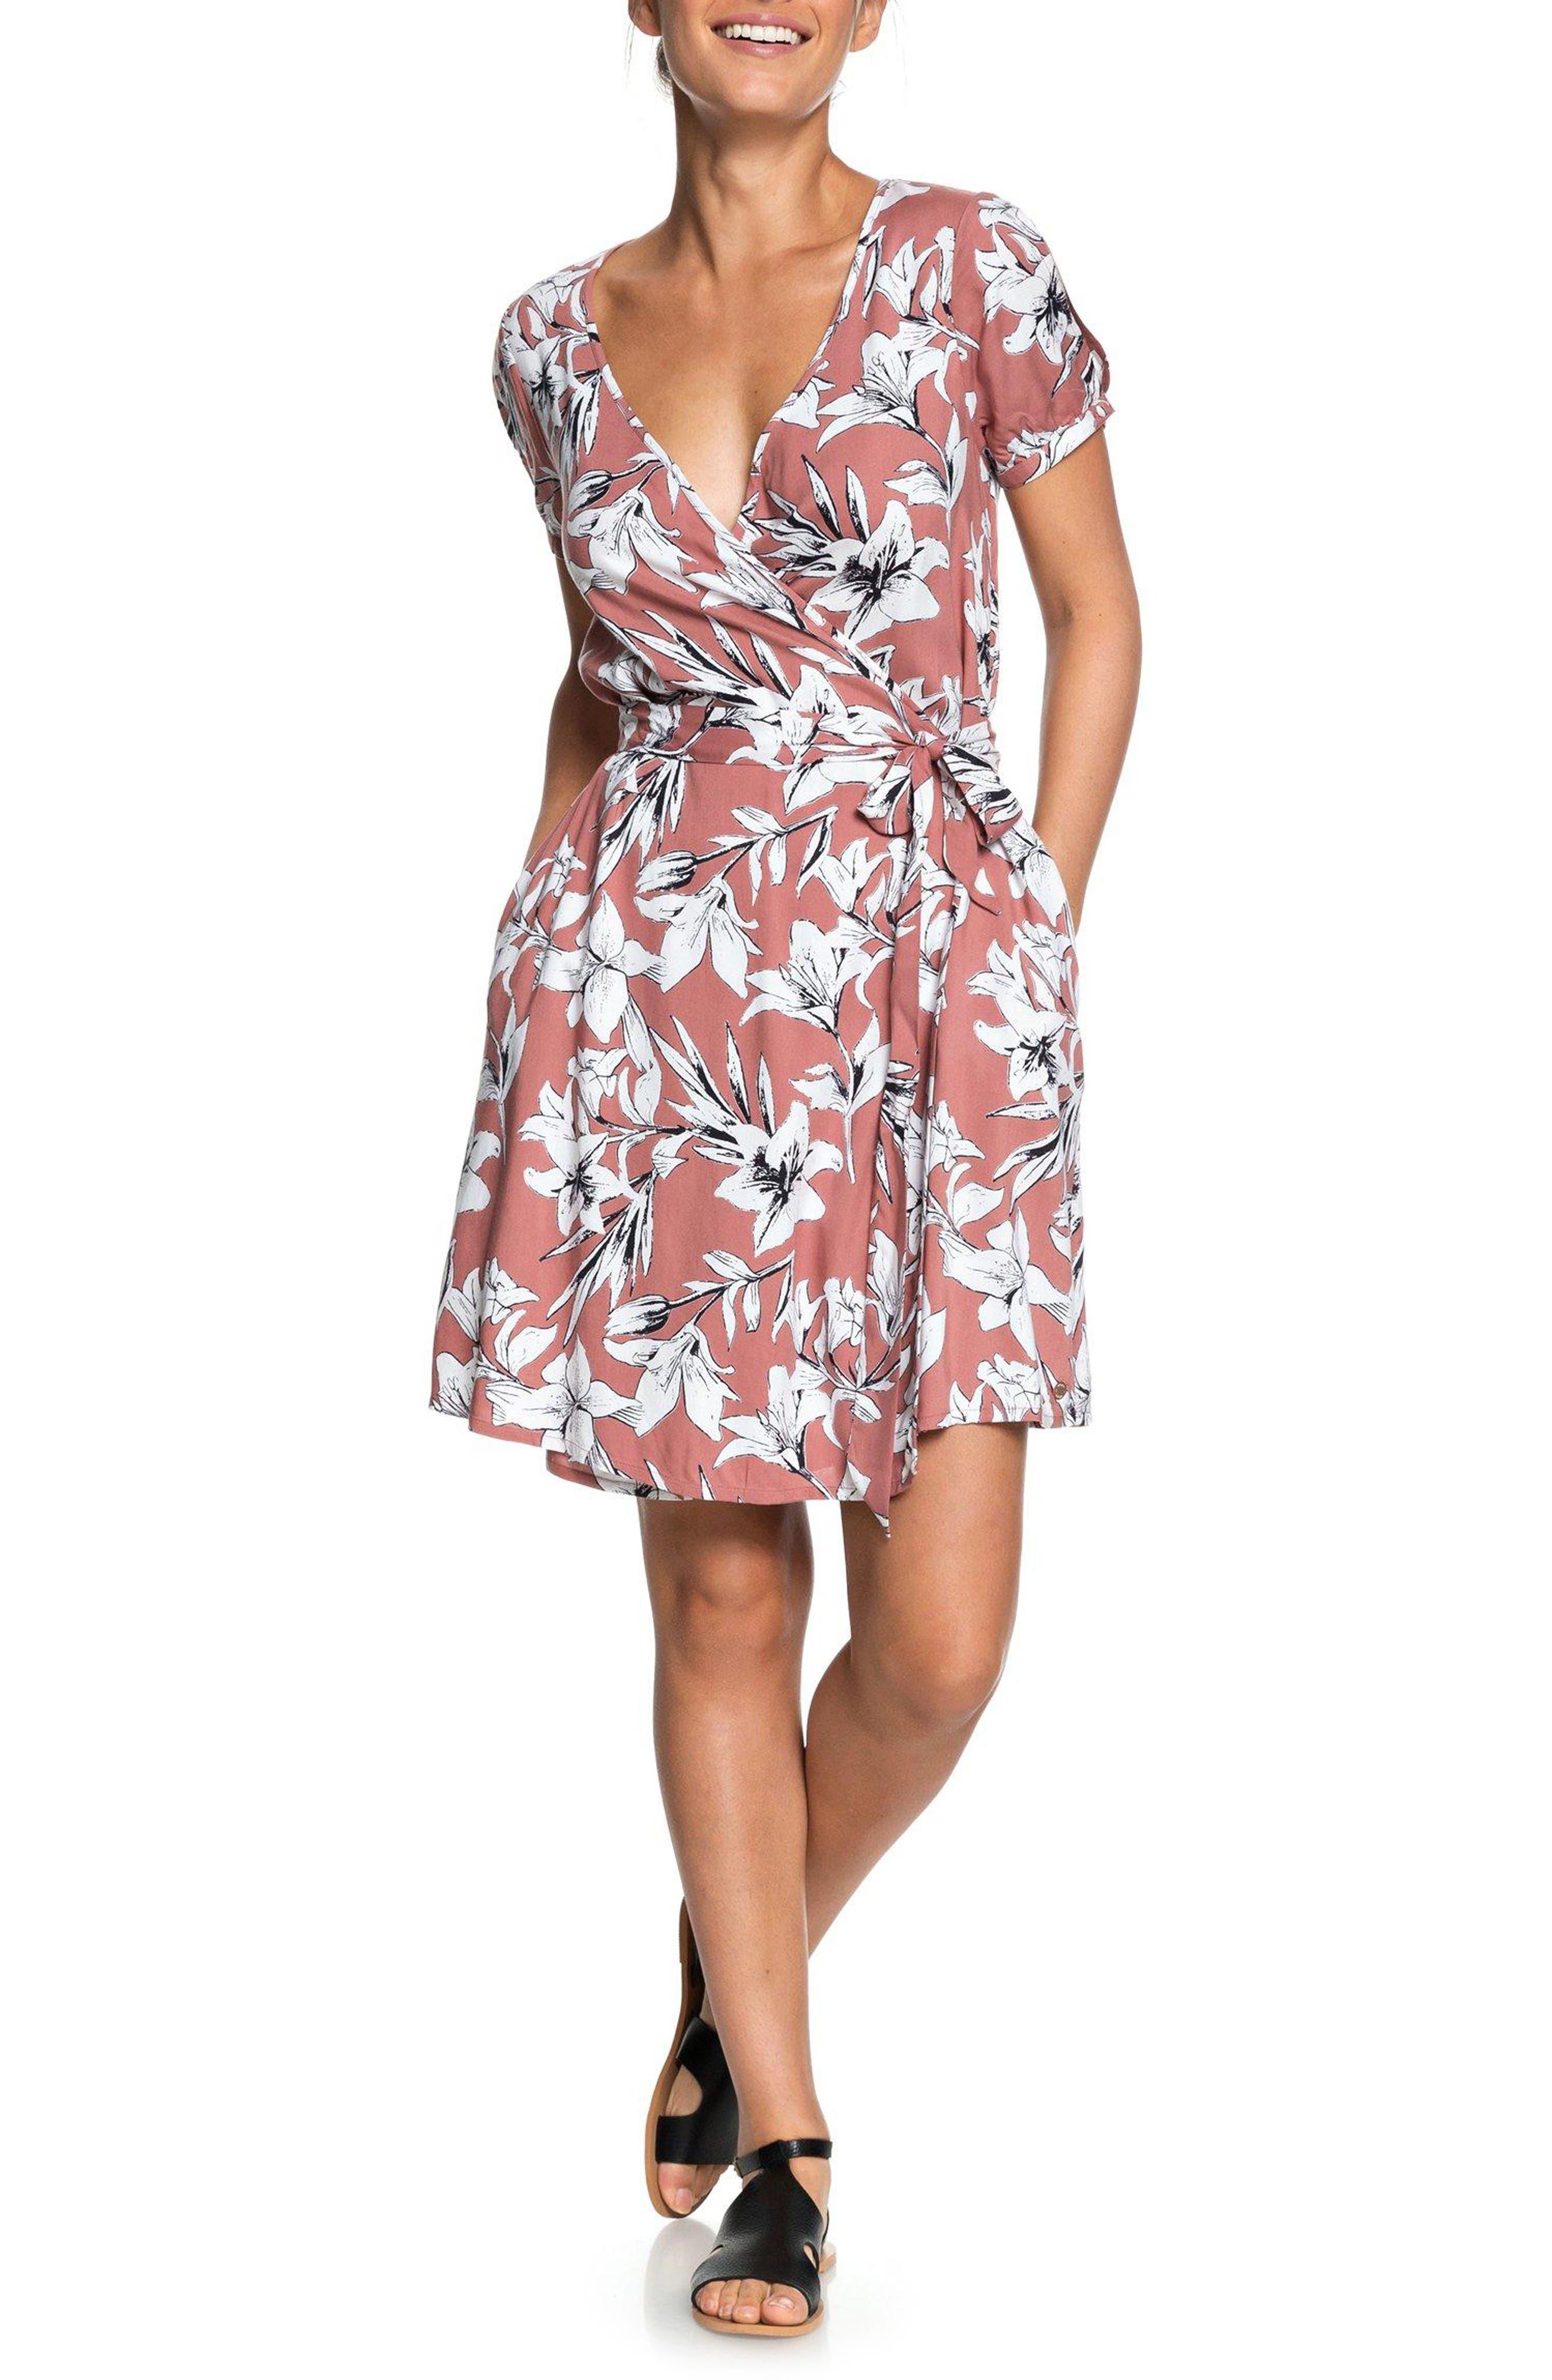 Roxy Monument View Floral Print Wrap Dress, Pink